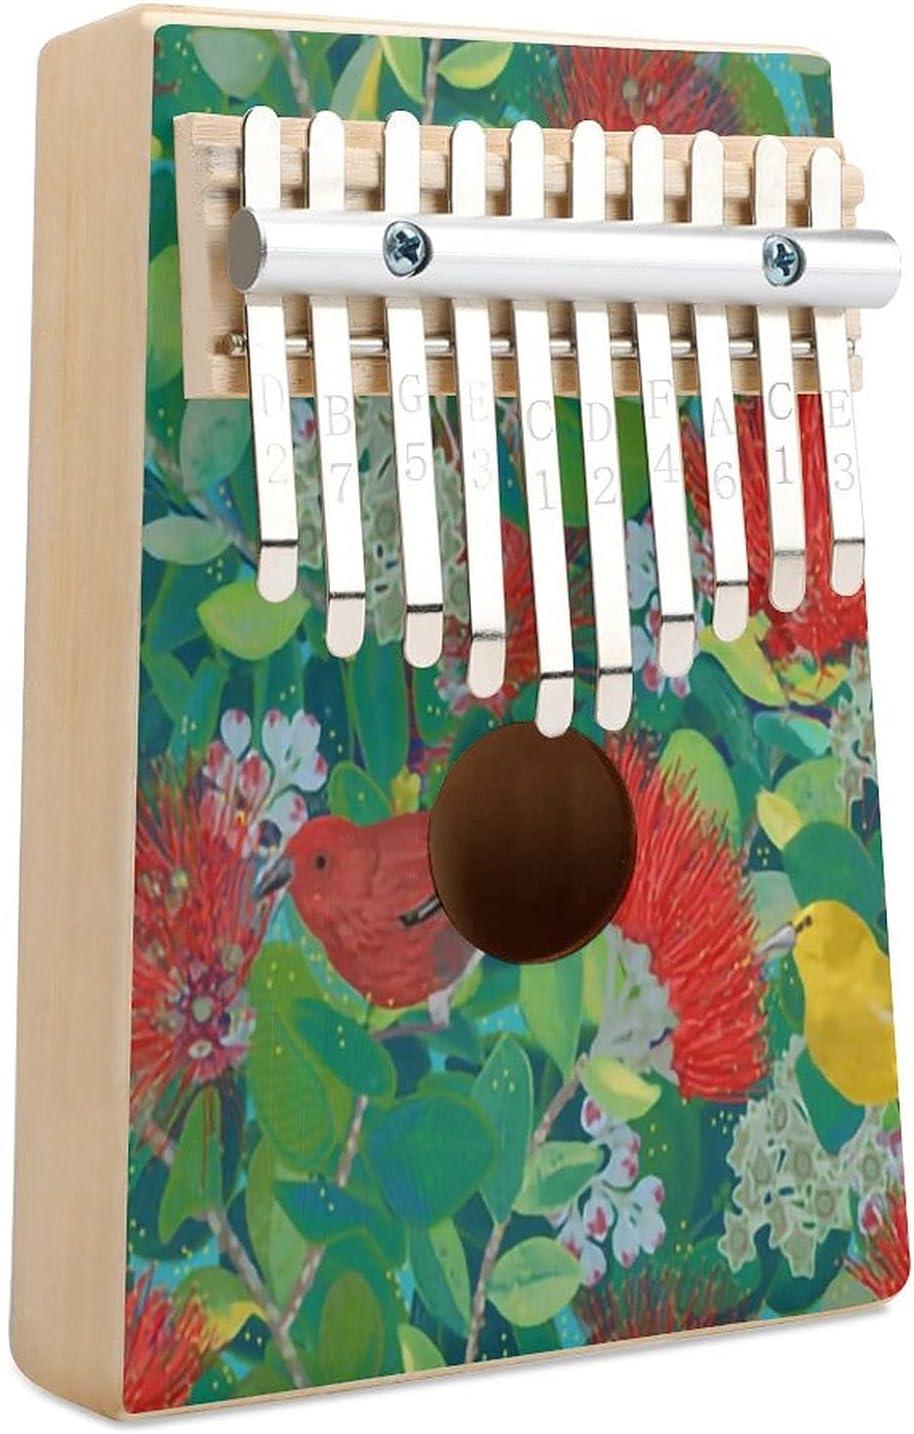 Ohia Life Kalimba Sales results Quantity limited No. 1 Thumb Piano Musical Key 10 Instru Finger